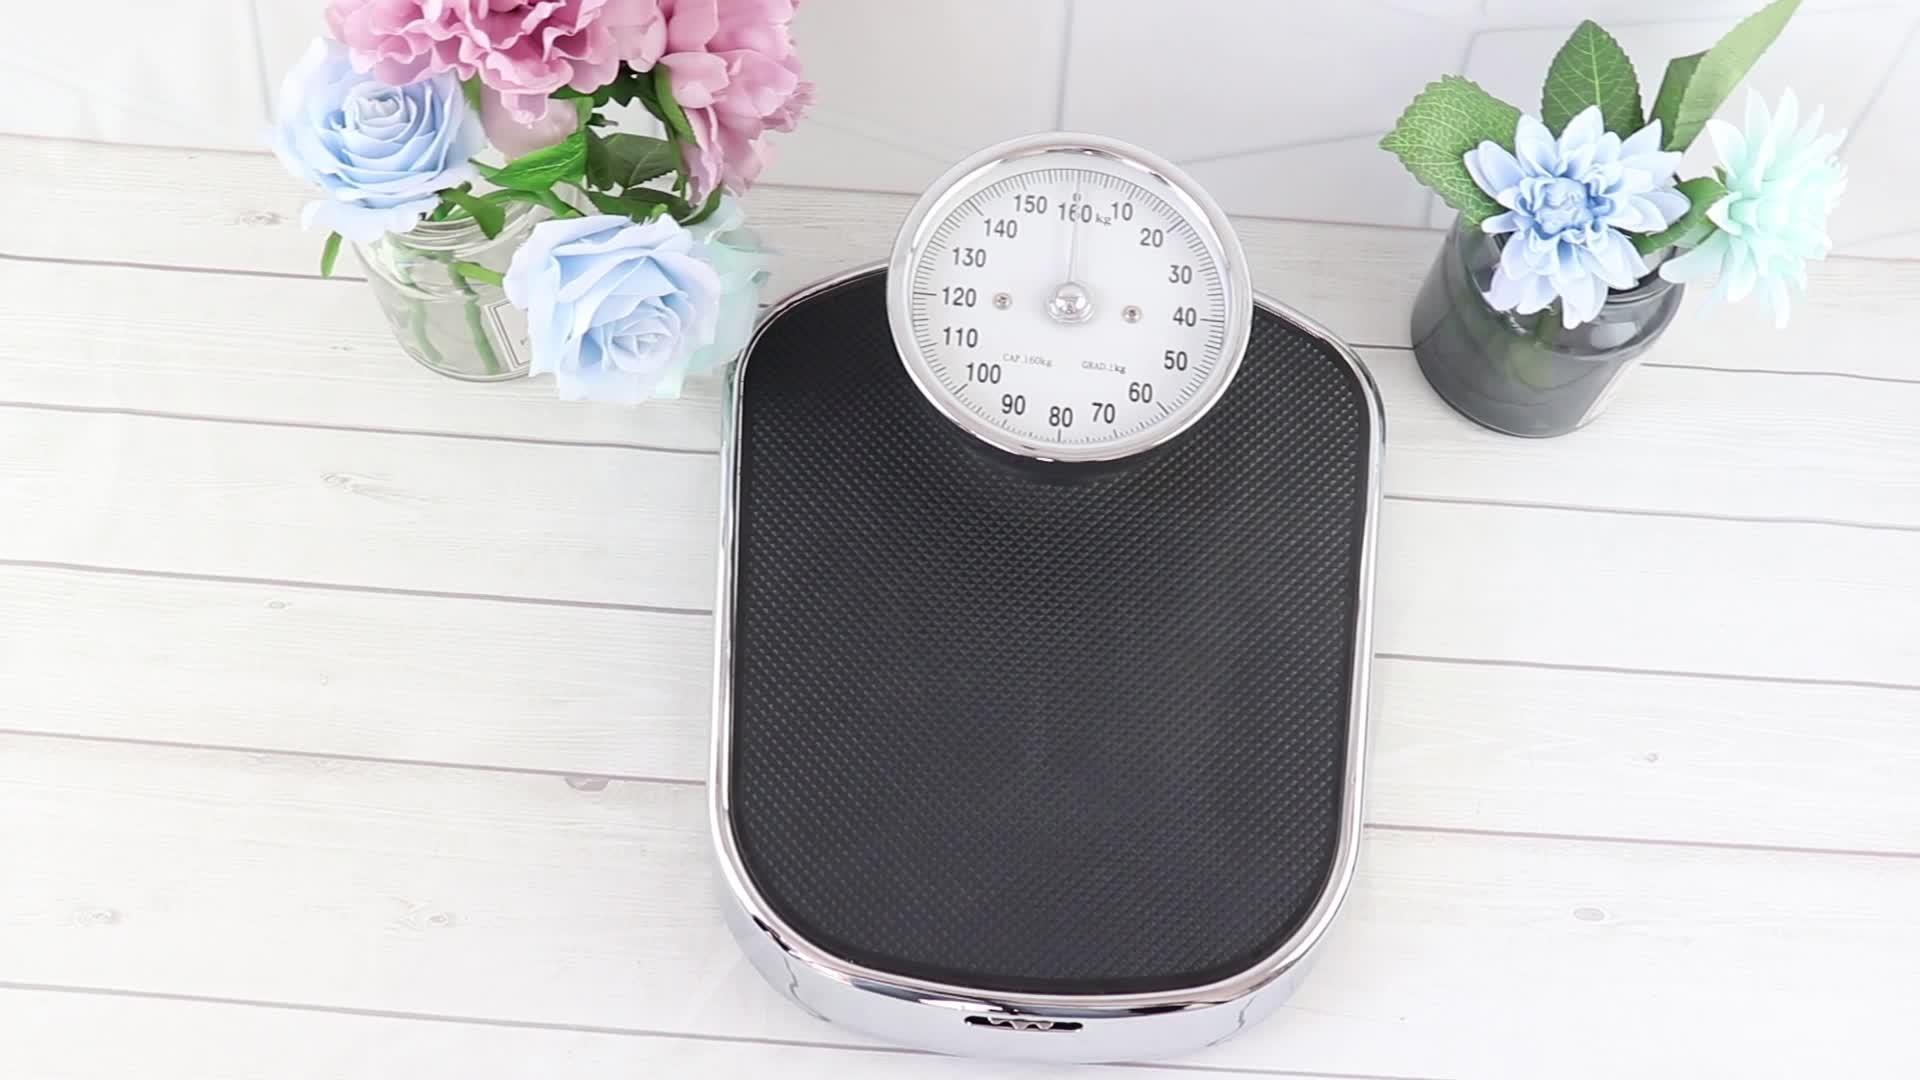 160kg Anti-Slip Surface Bathroom Medical Mechanical Body Weegschaal